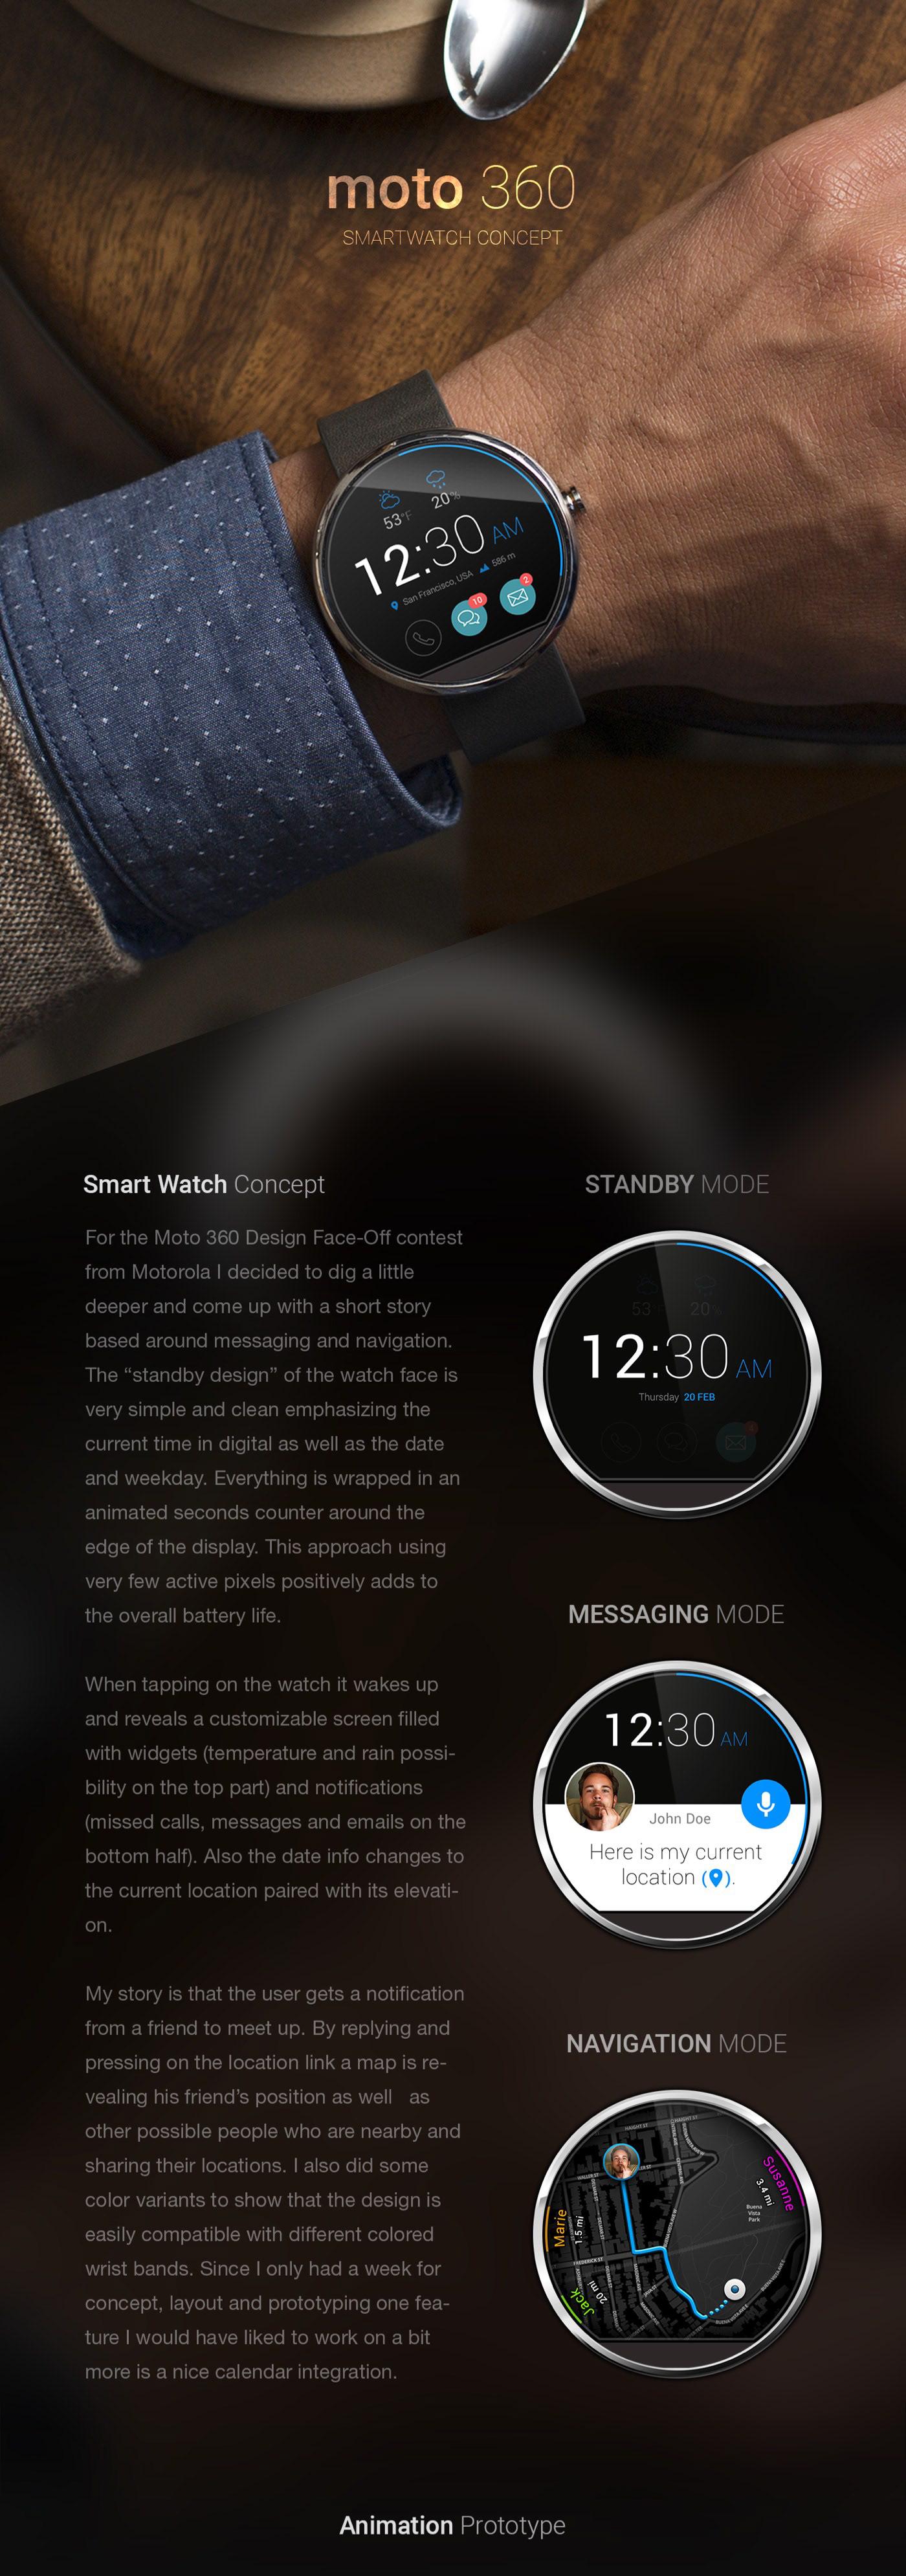 moto360 smart watch